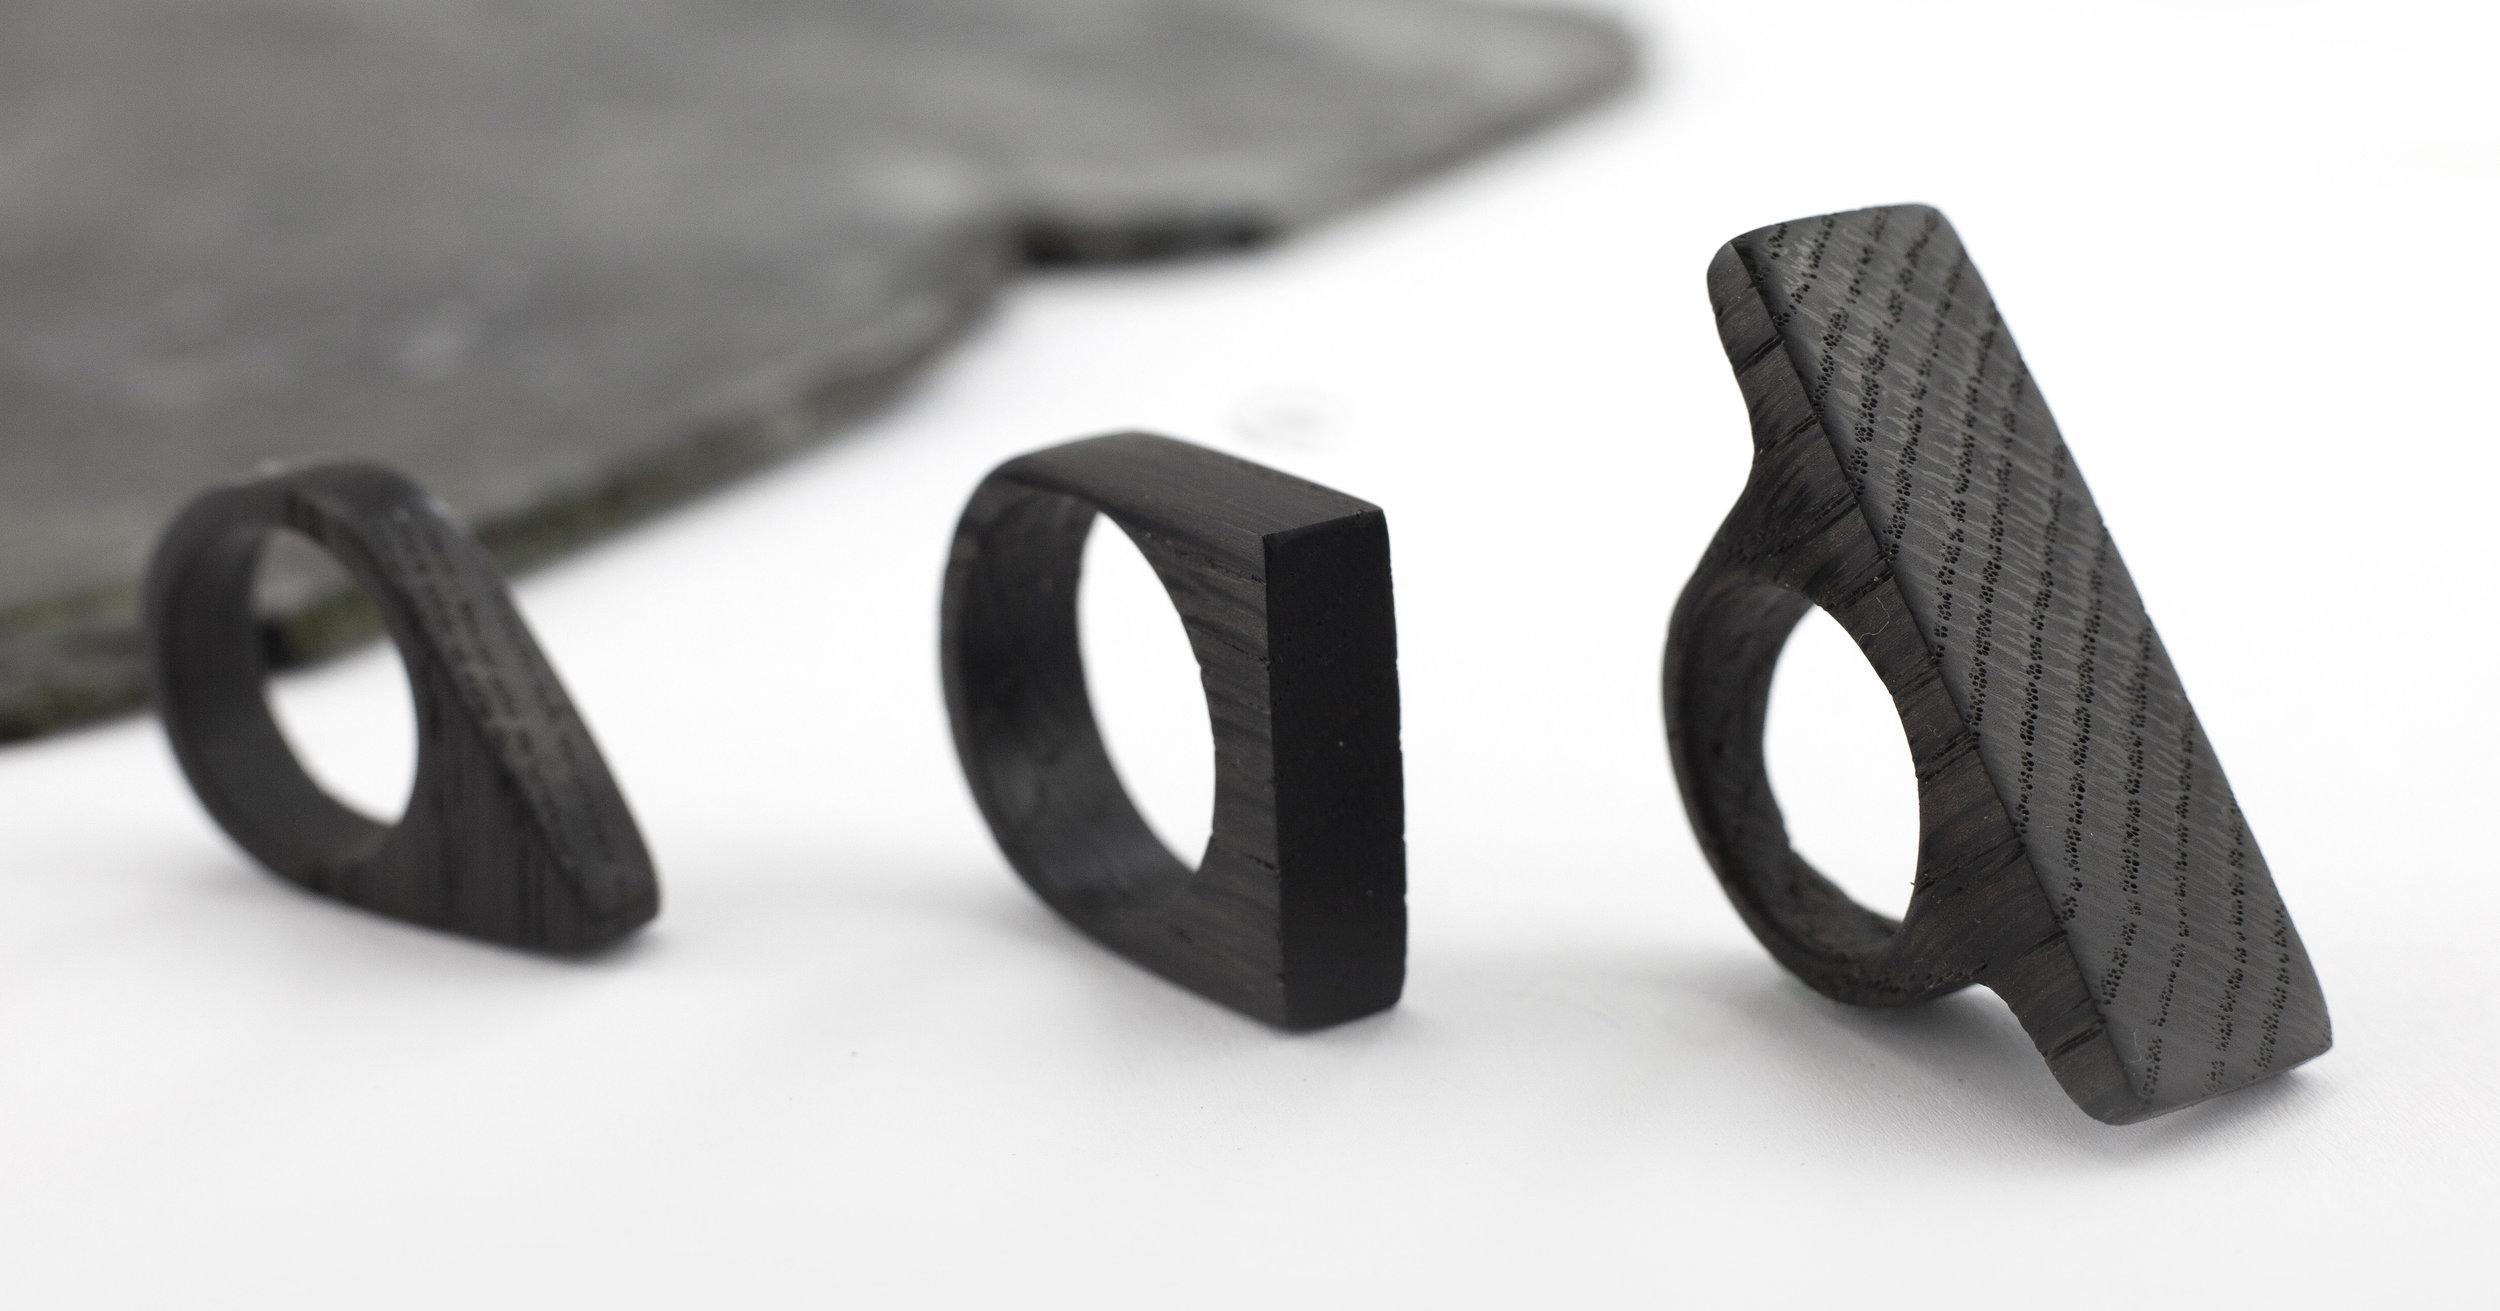 leko-rings-bogoak-handcrafted.jpg